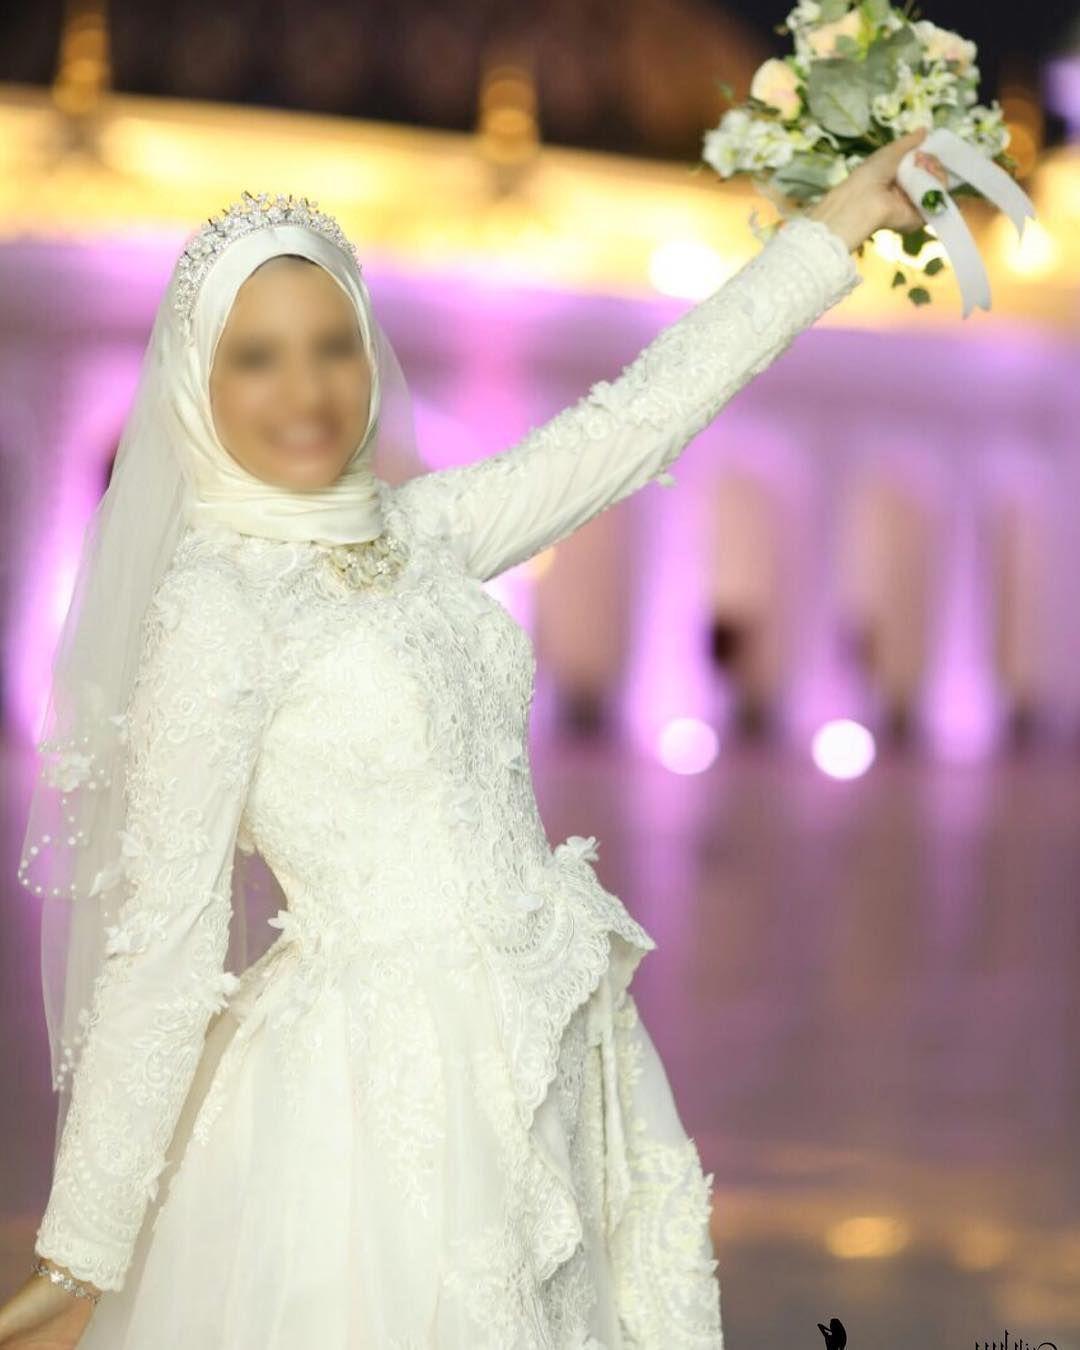 Dina yasser on instagram new design wedding dress